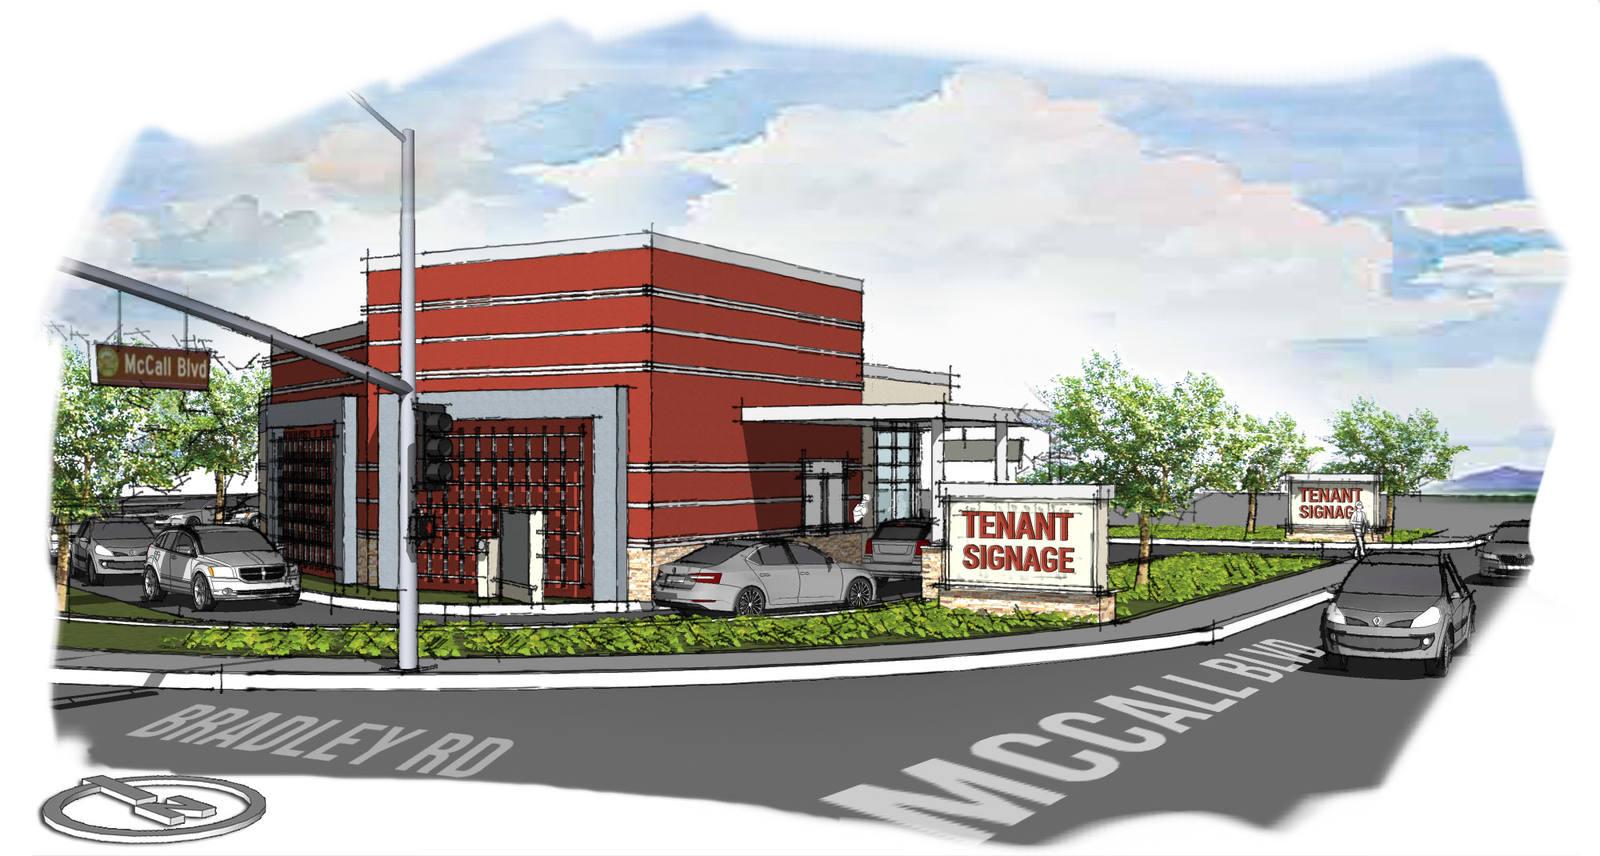 CBRE RetailMenifee-26820 McCall Blvd-Drive Thru Building 2,400+ Sq. Ft.26820 Mccall Blvd  Photo